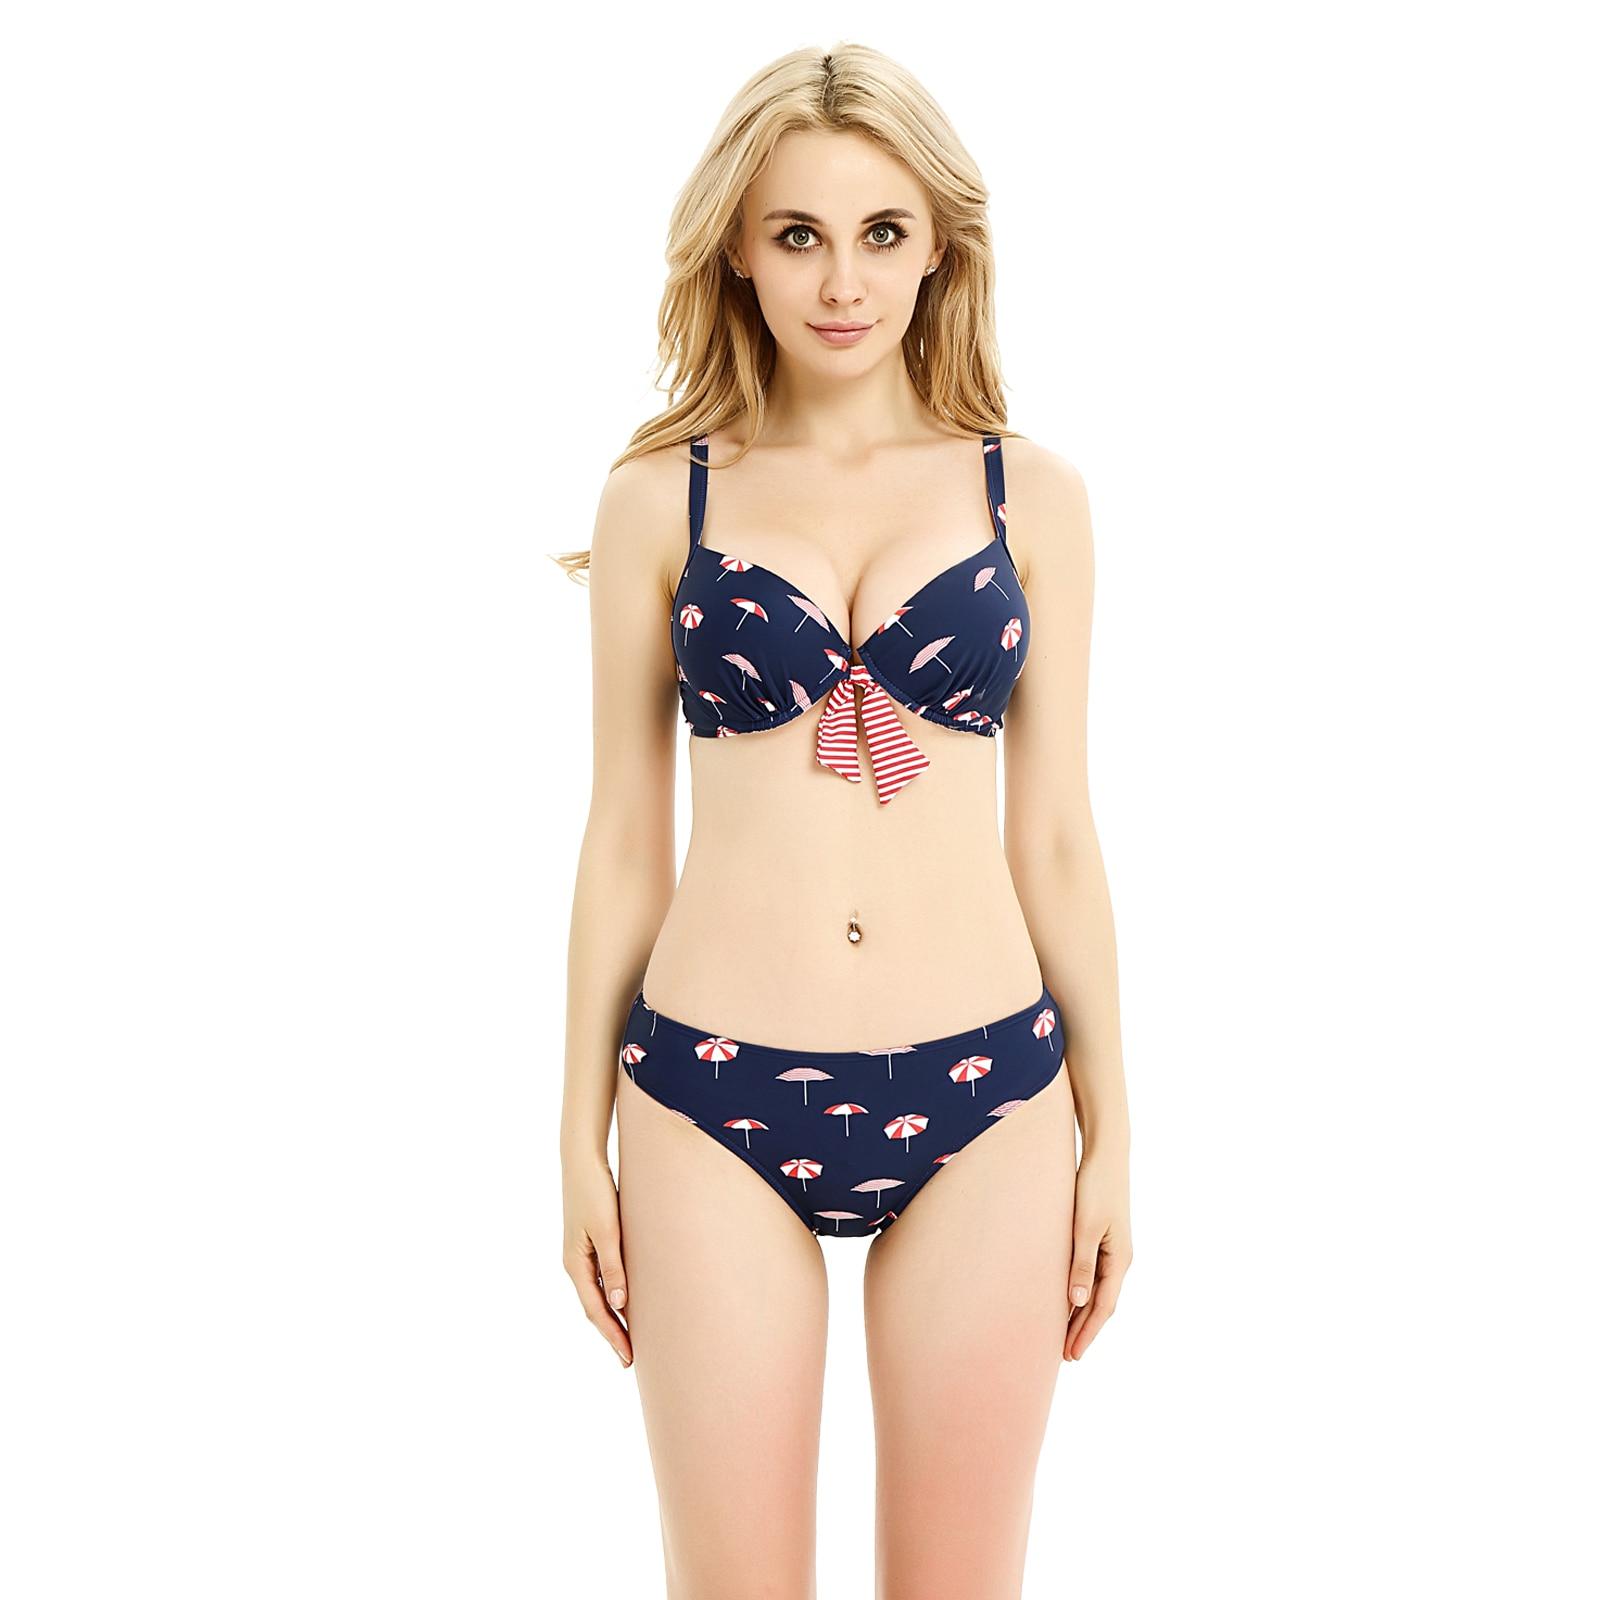 Umbrella Print Push Up Swimsuit Low Waist Bottom Bikini Set 2017 Sexy Swimwear Padded Beach Wear Bathing Suit Bow Center Biqunis<br><br>Aliexpress